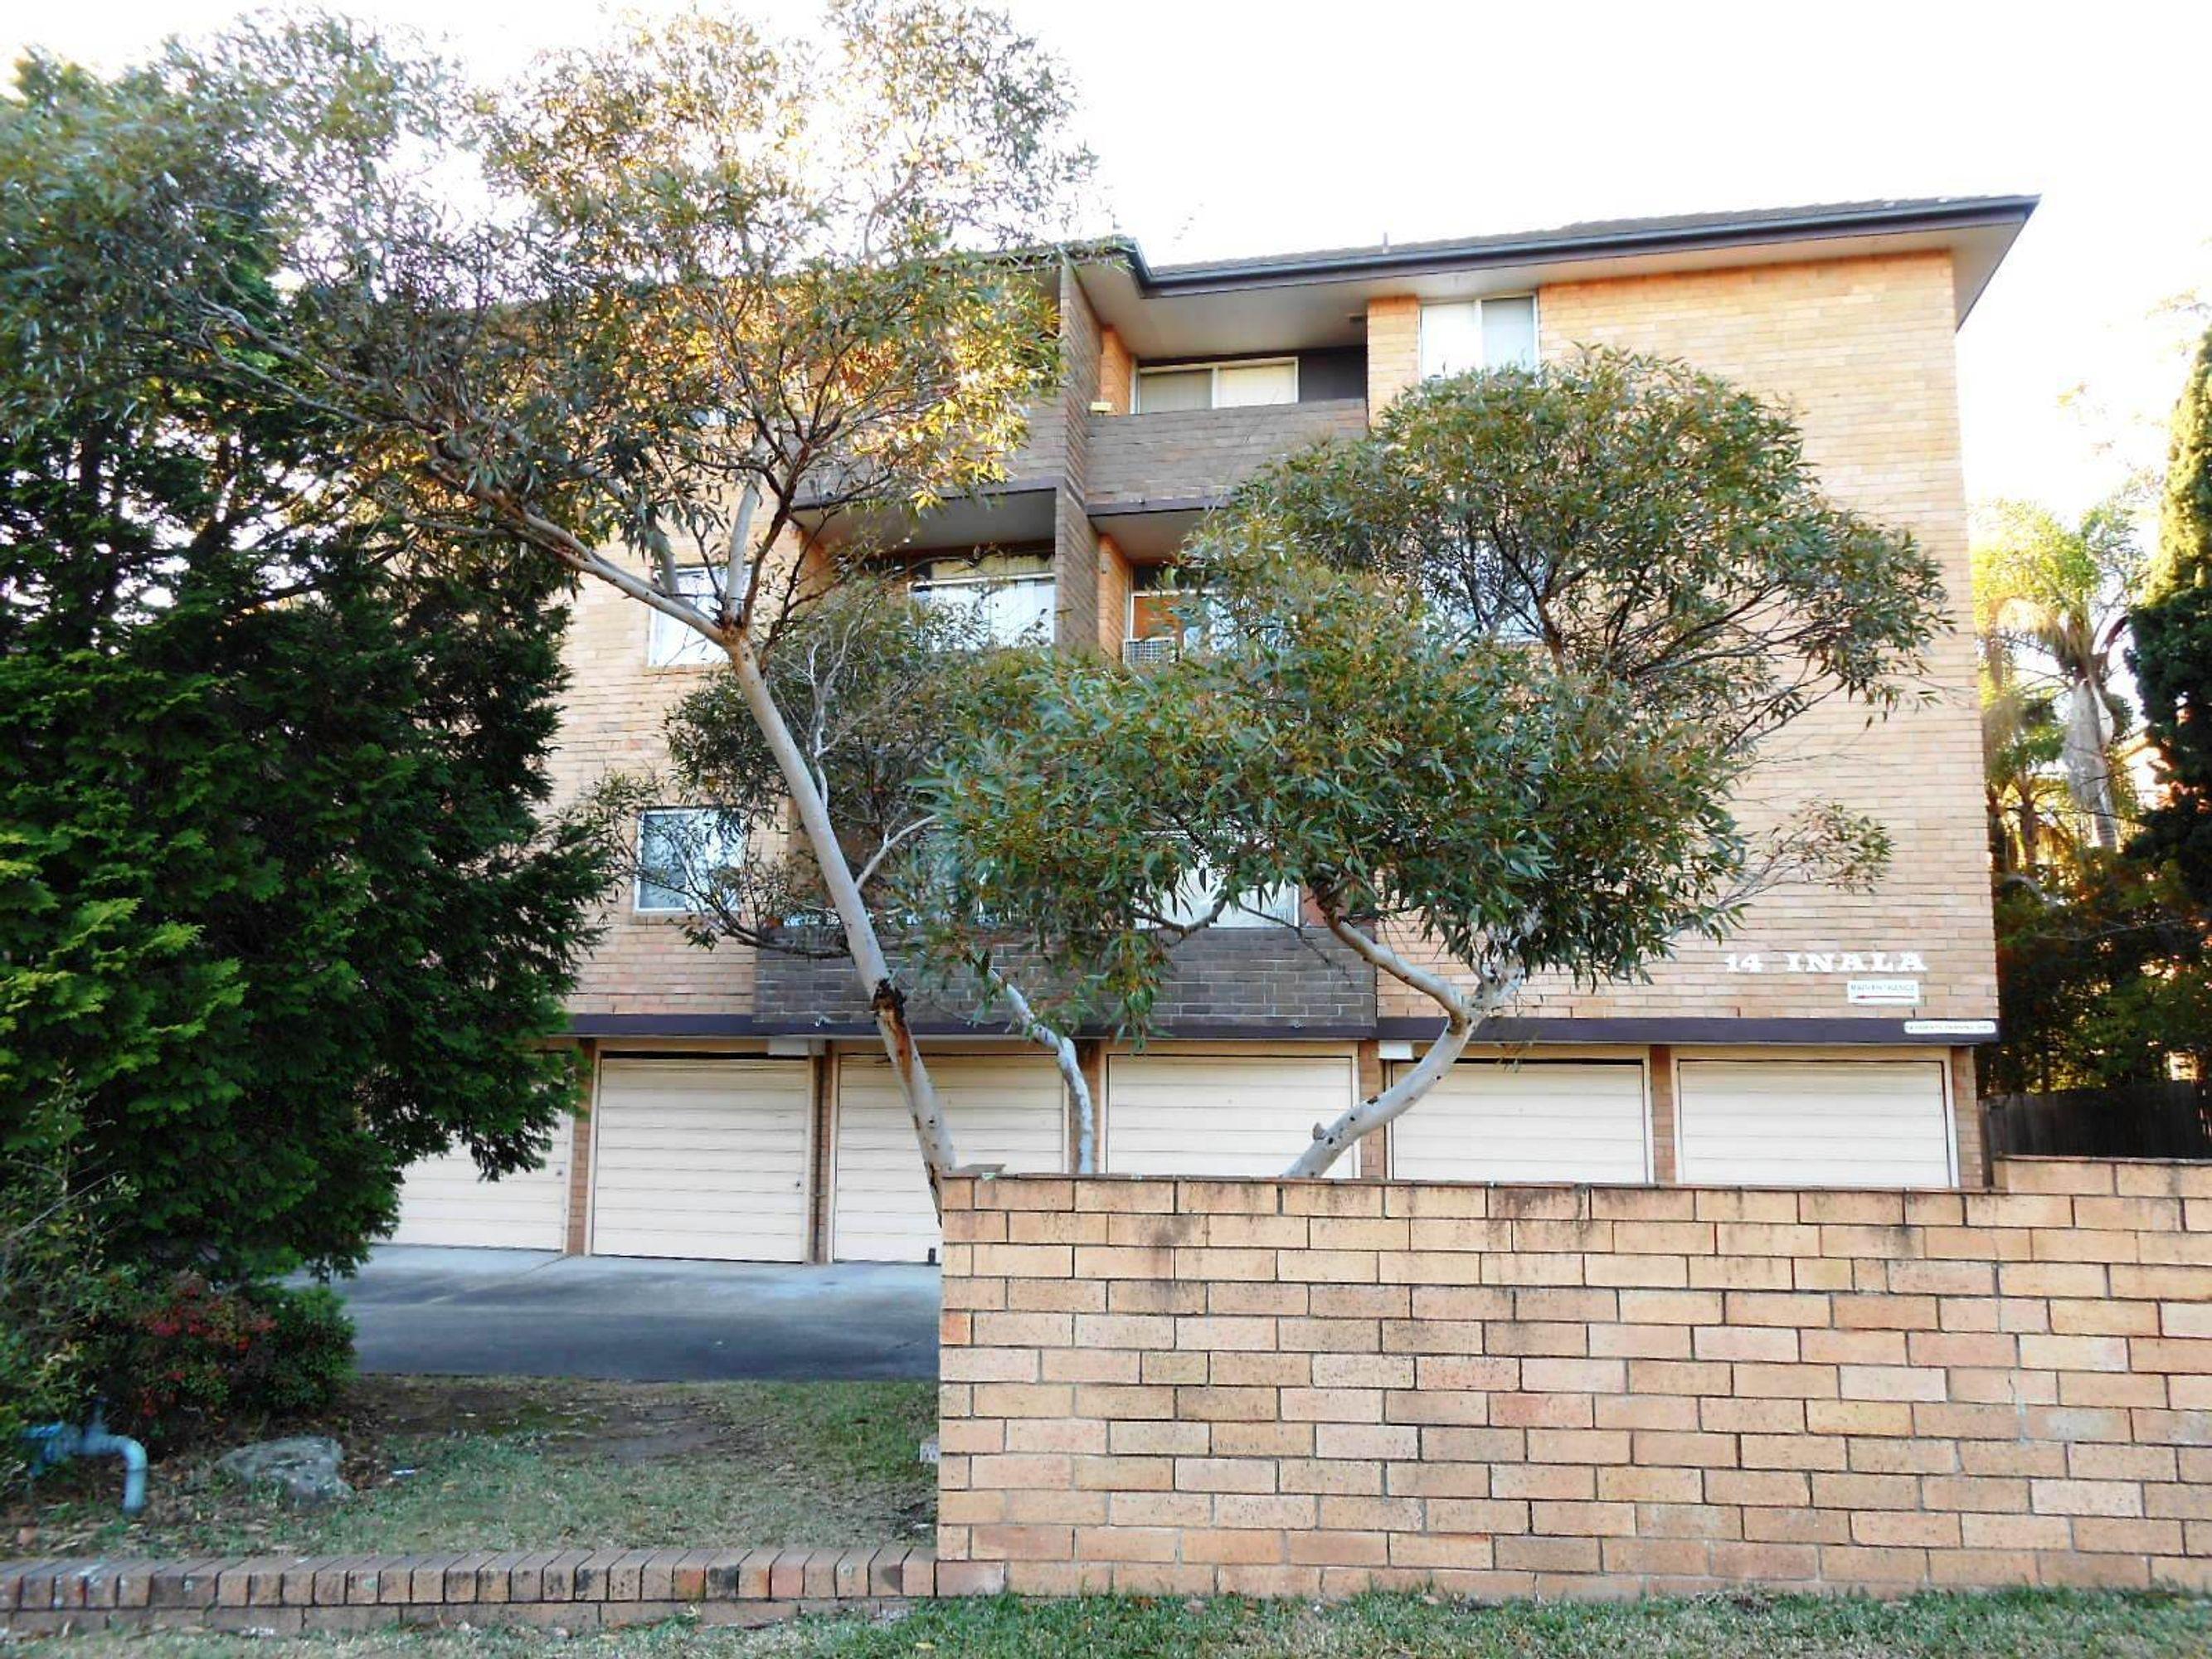 12/14 Maxim Street, West Ryde, NSW 2114